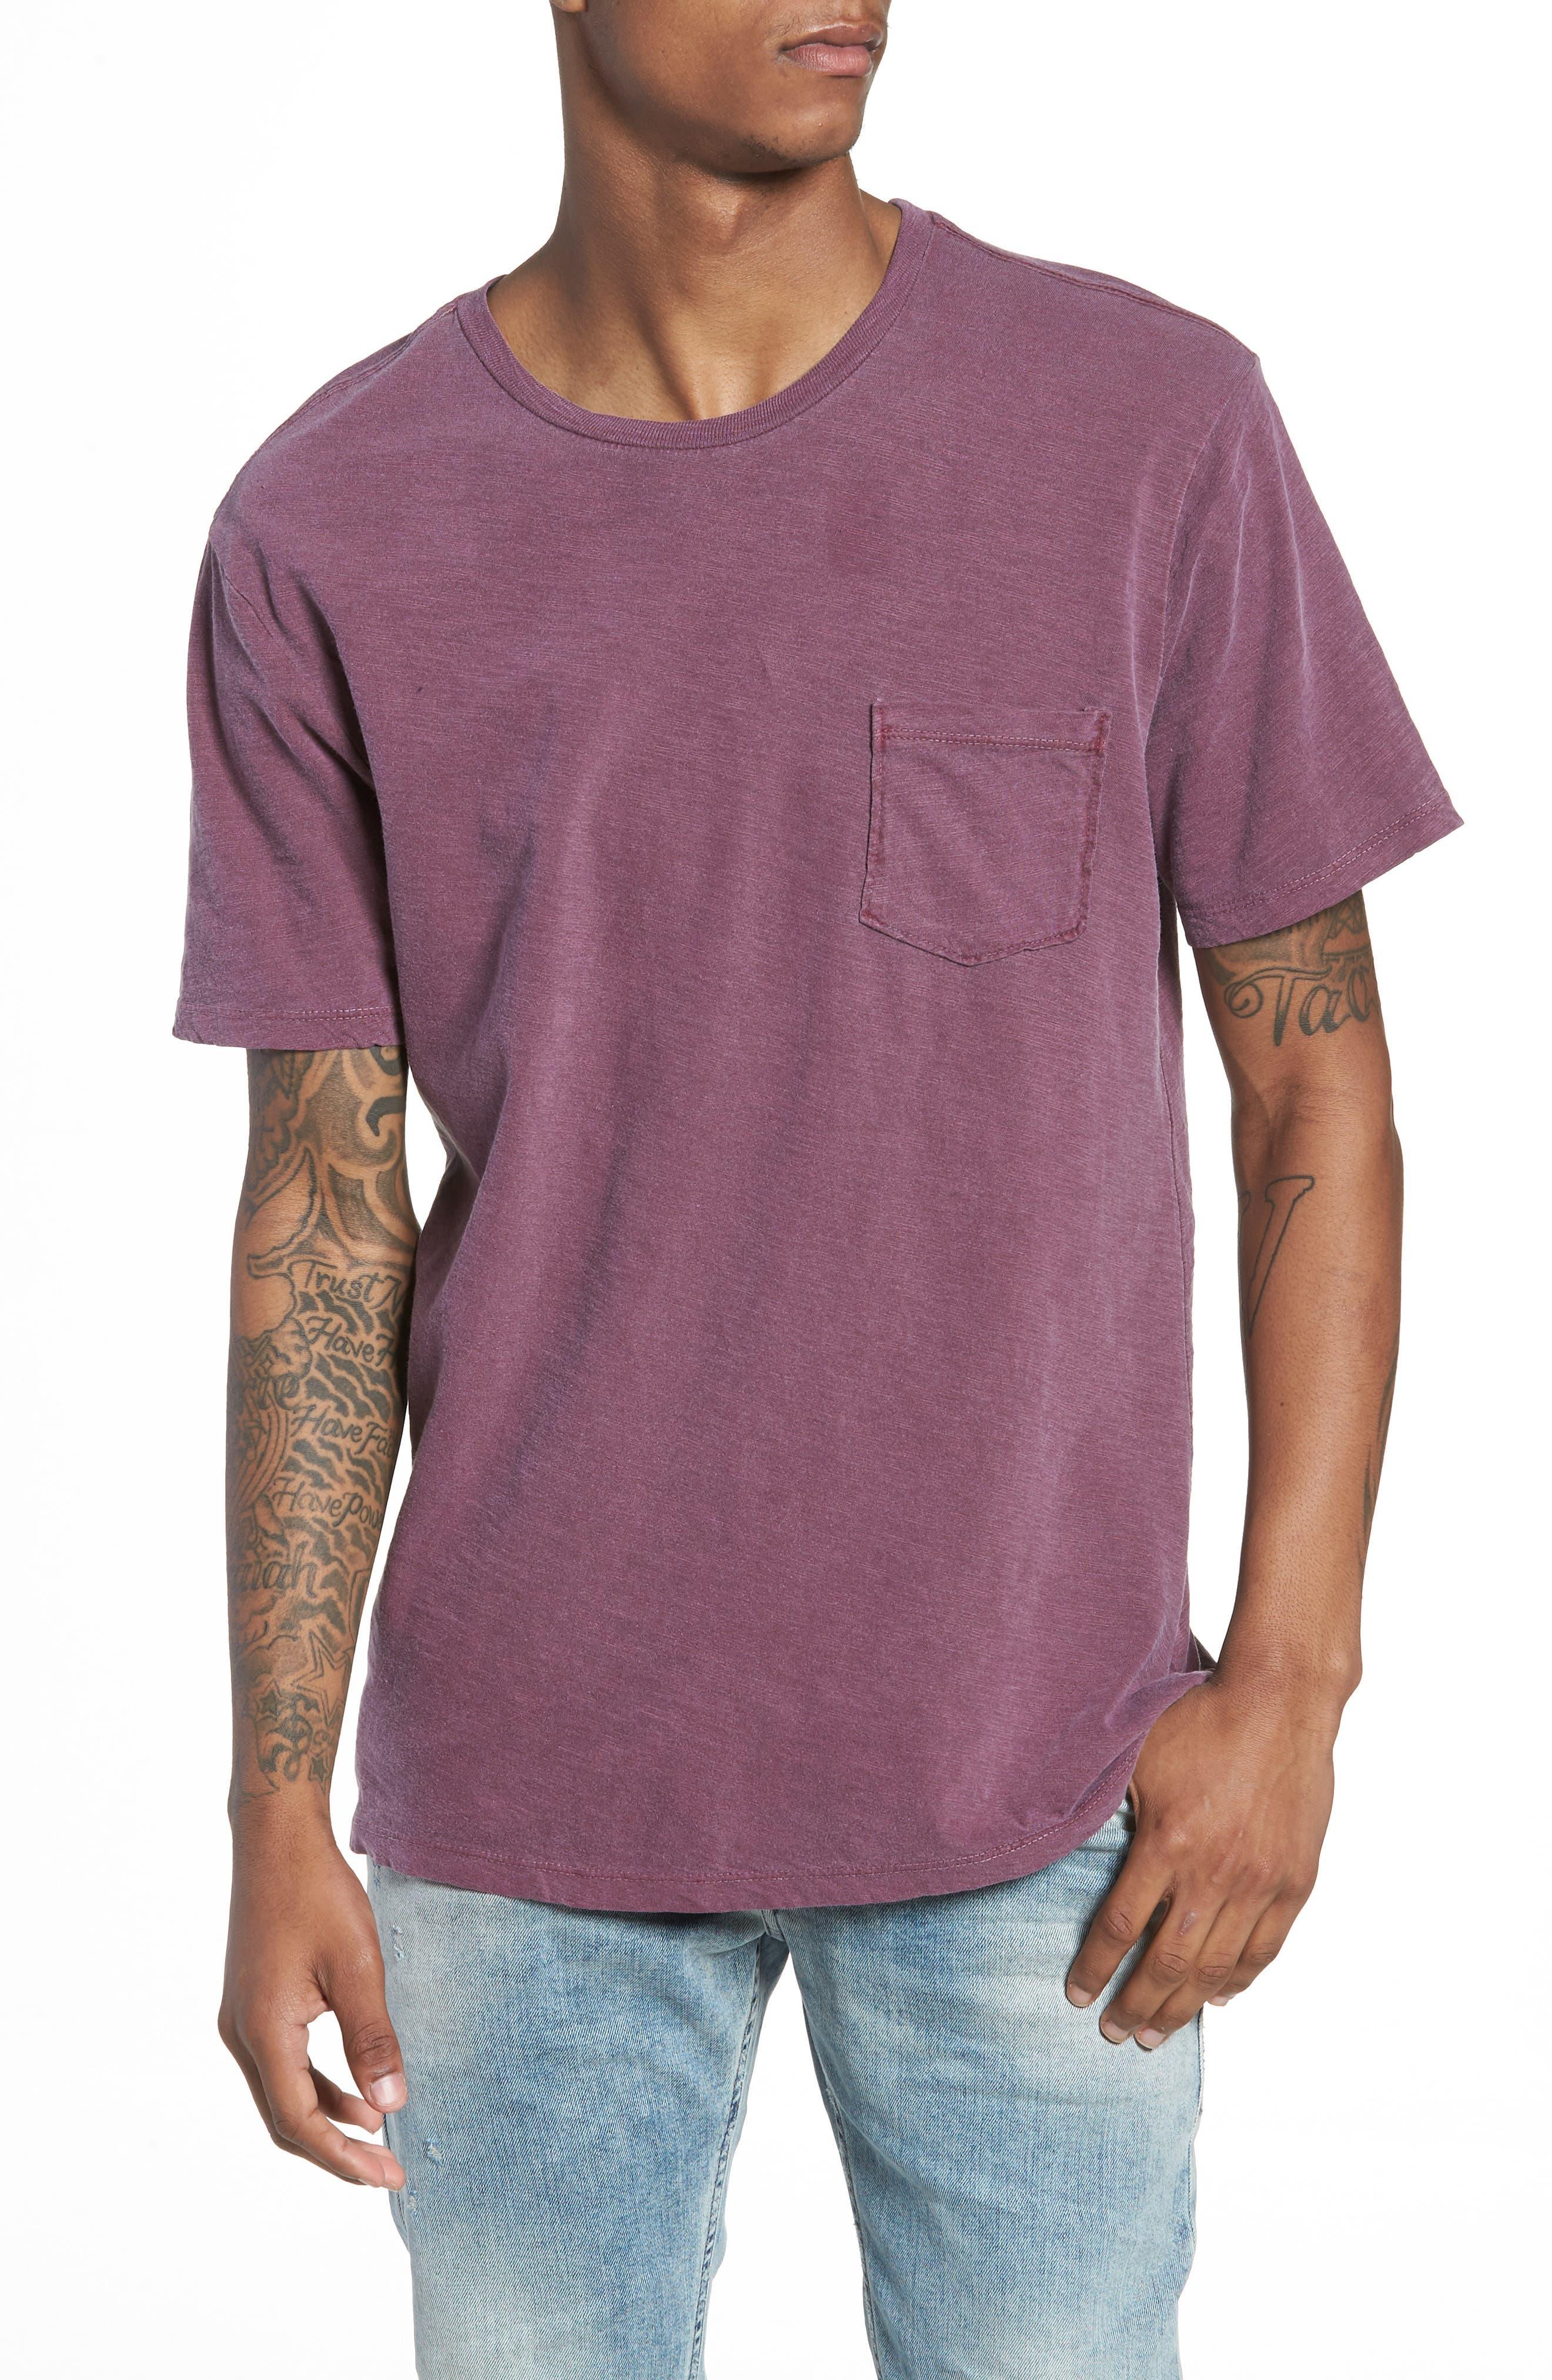 The Rail Garment Washed Pocket T-Shirt